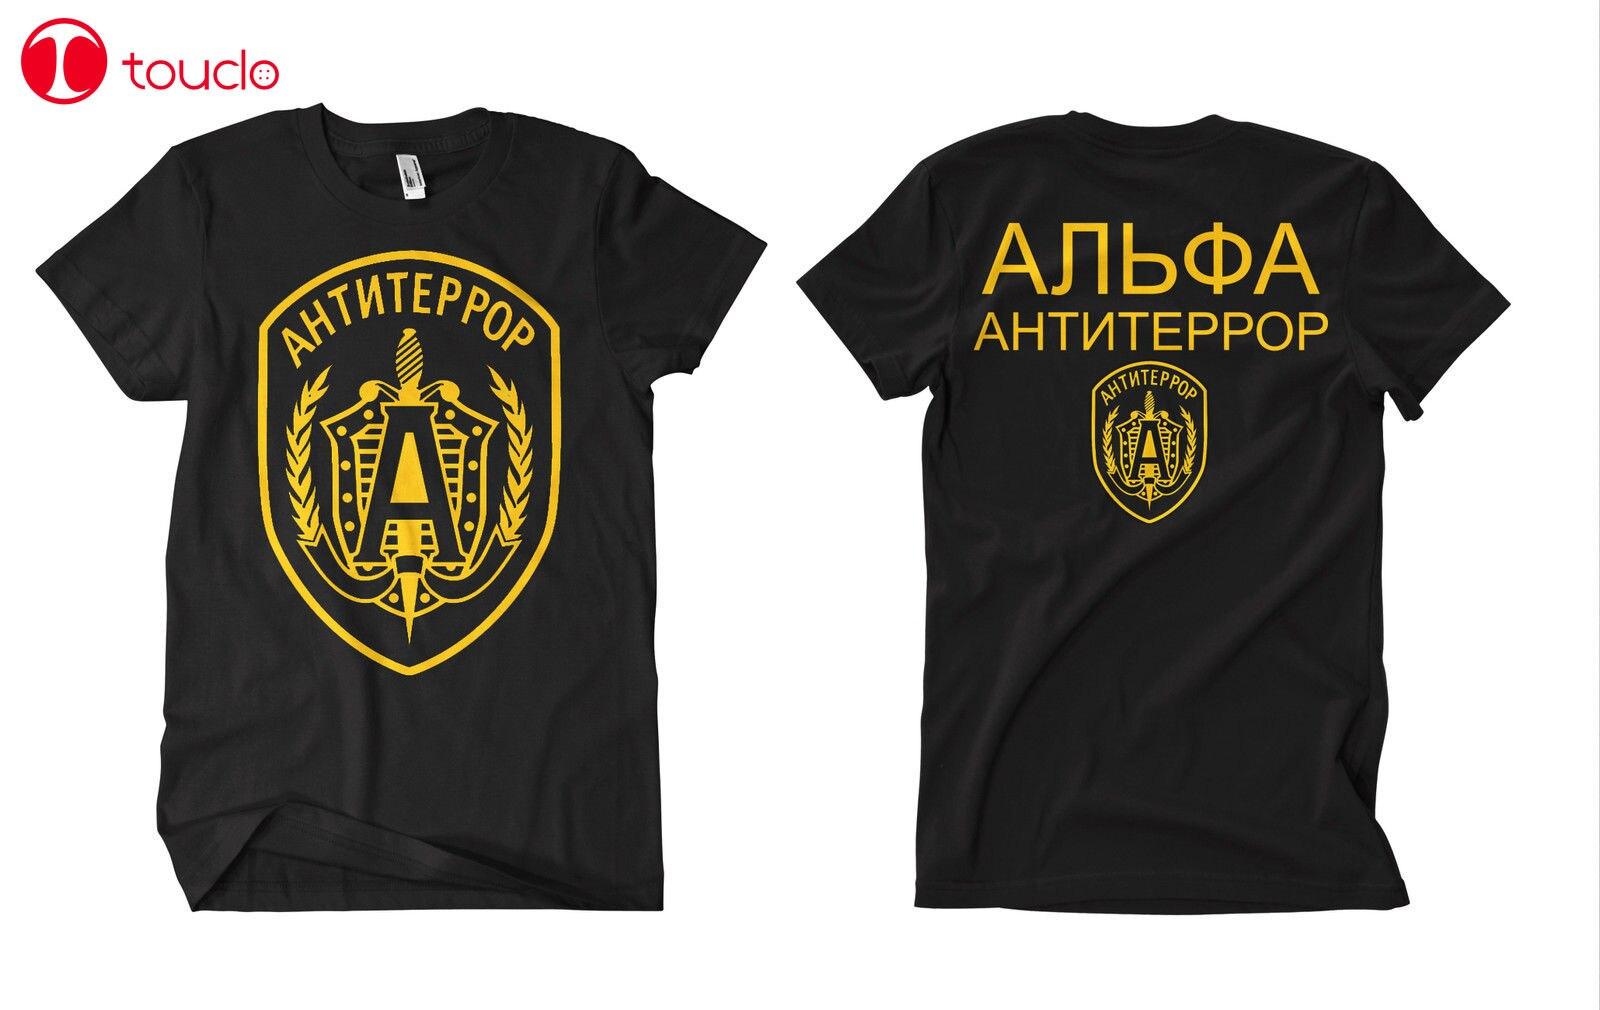 Camiseta de doble cara R novedad camiseta Spetsnas Alpha Antiterror (oro) russland Moskau Udssr Putin Fsb Gru película sudaderas con capucha